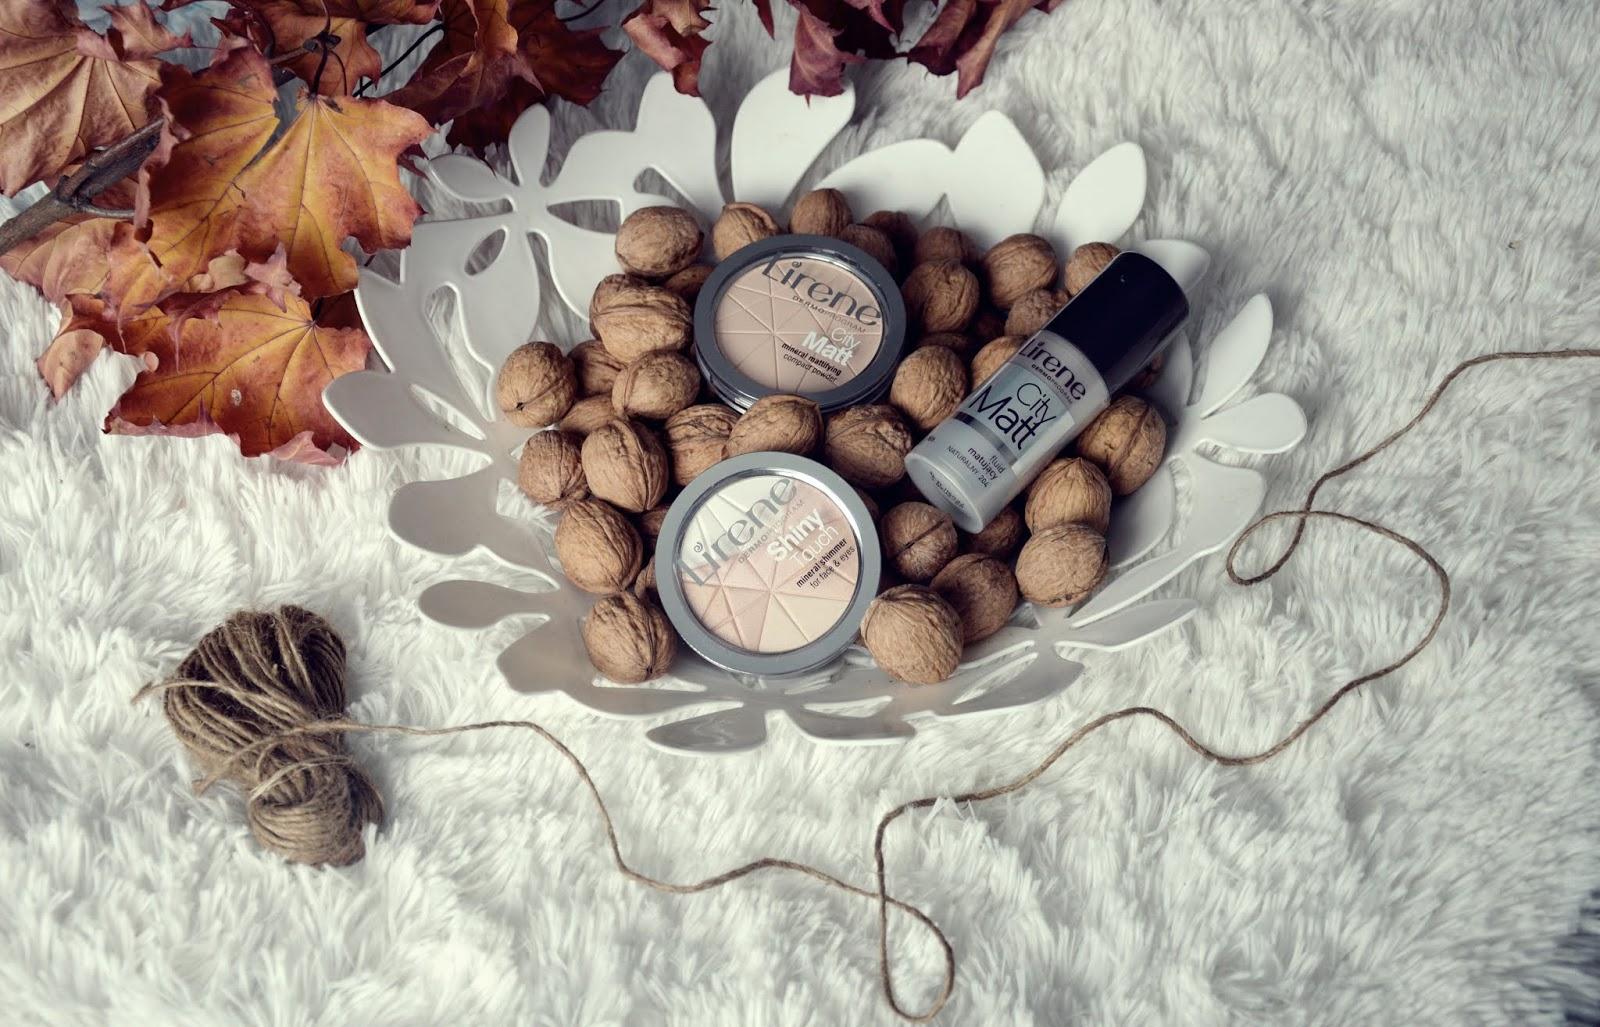 Produkty do makijażu od Lirene